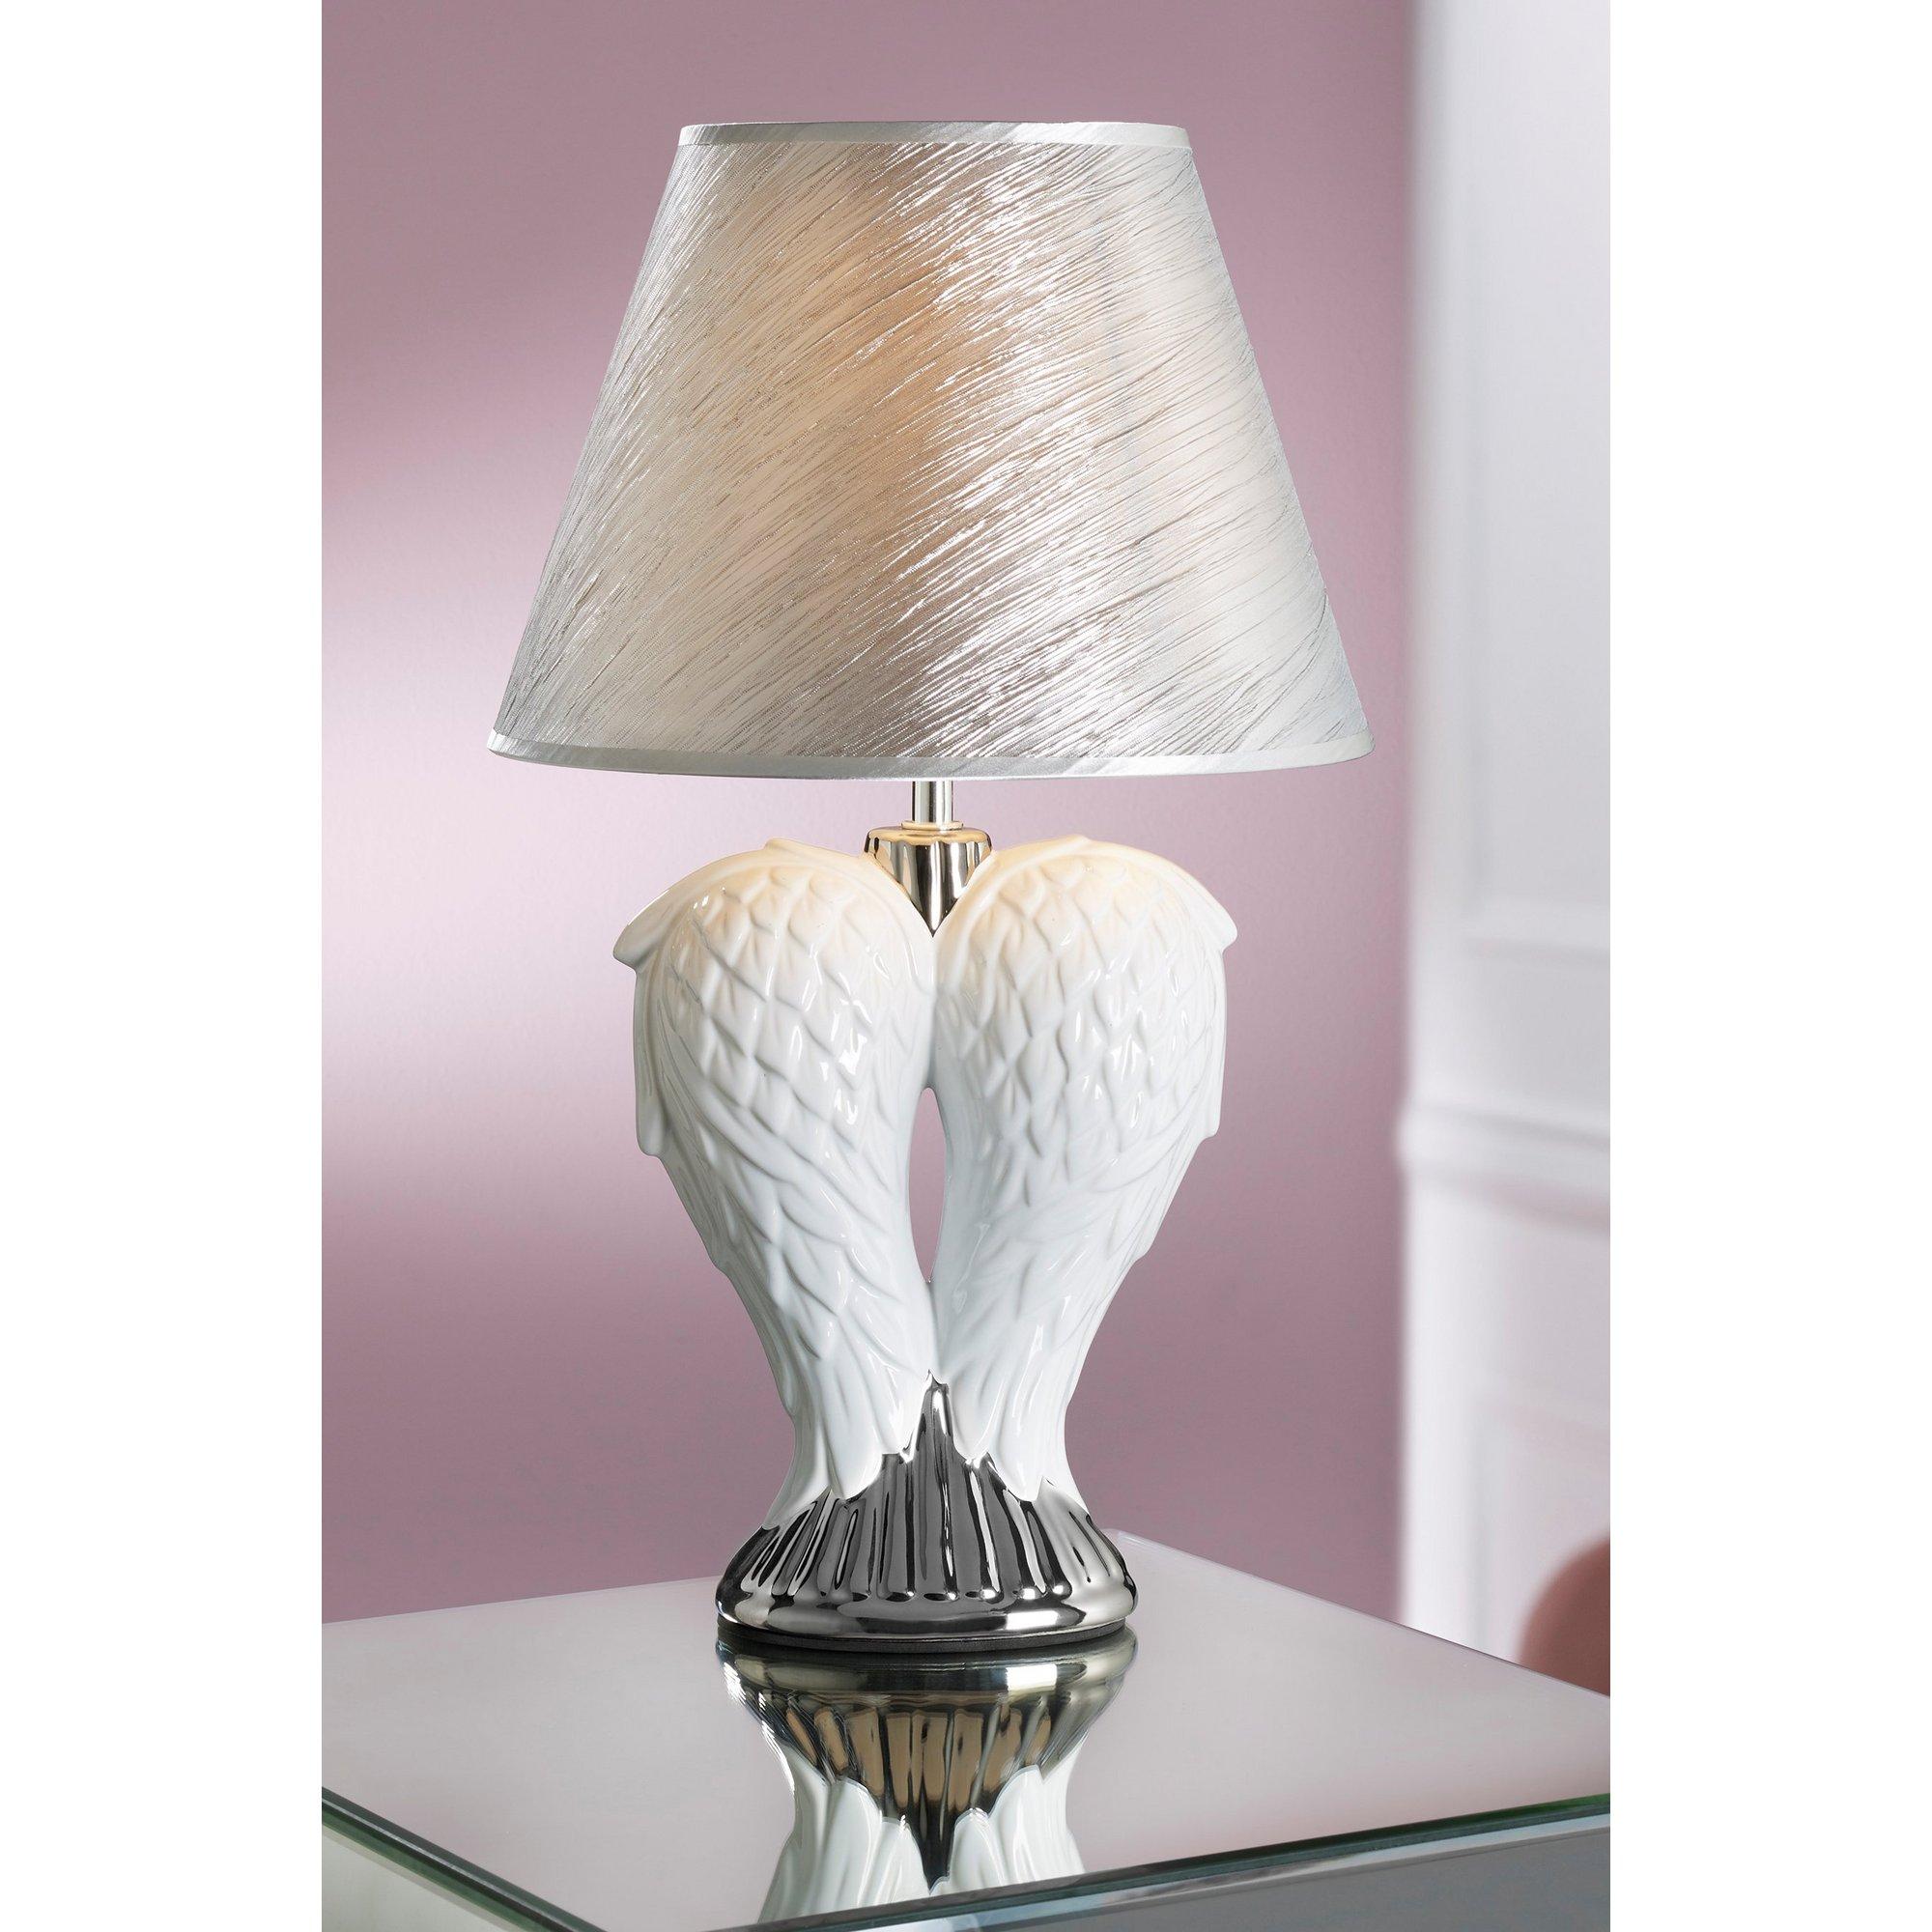 Image of Angel Wings Table Lamp